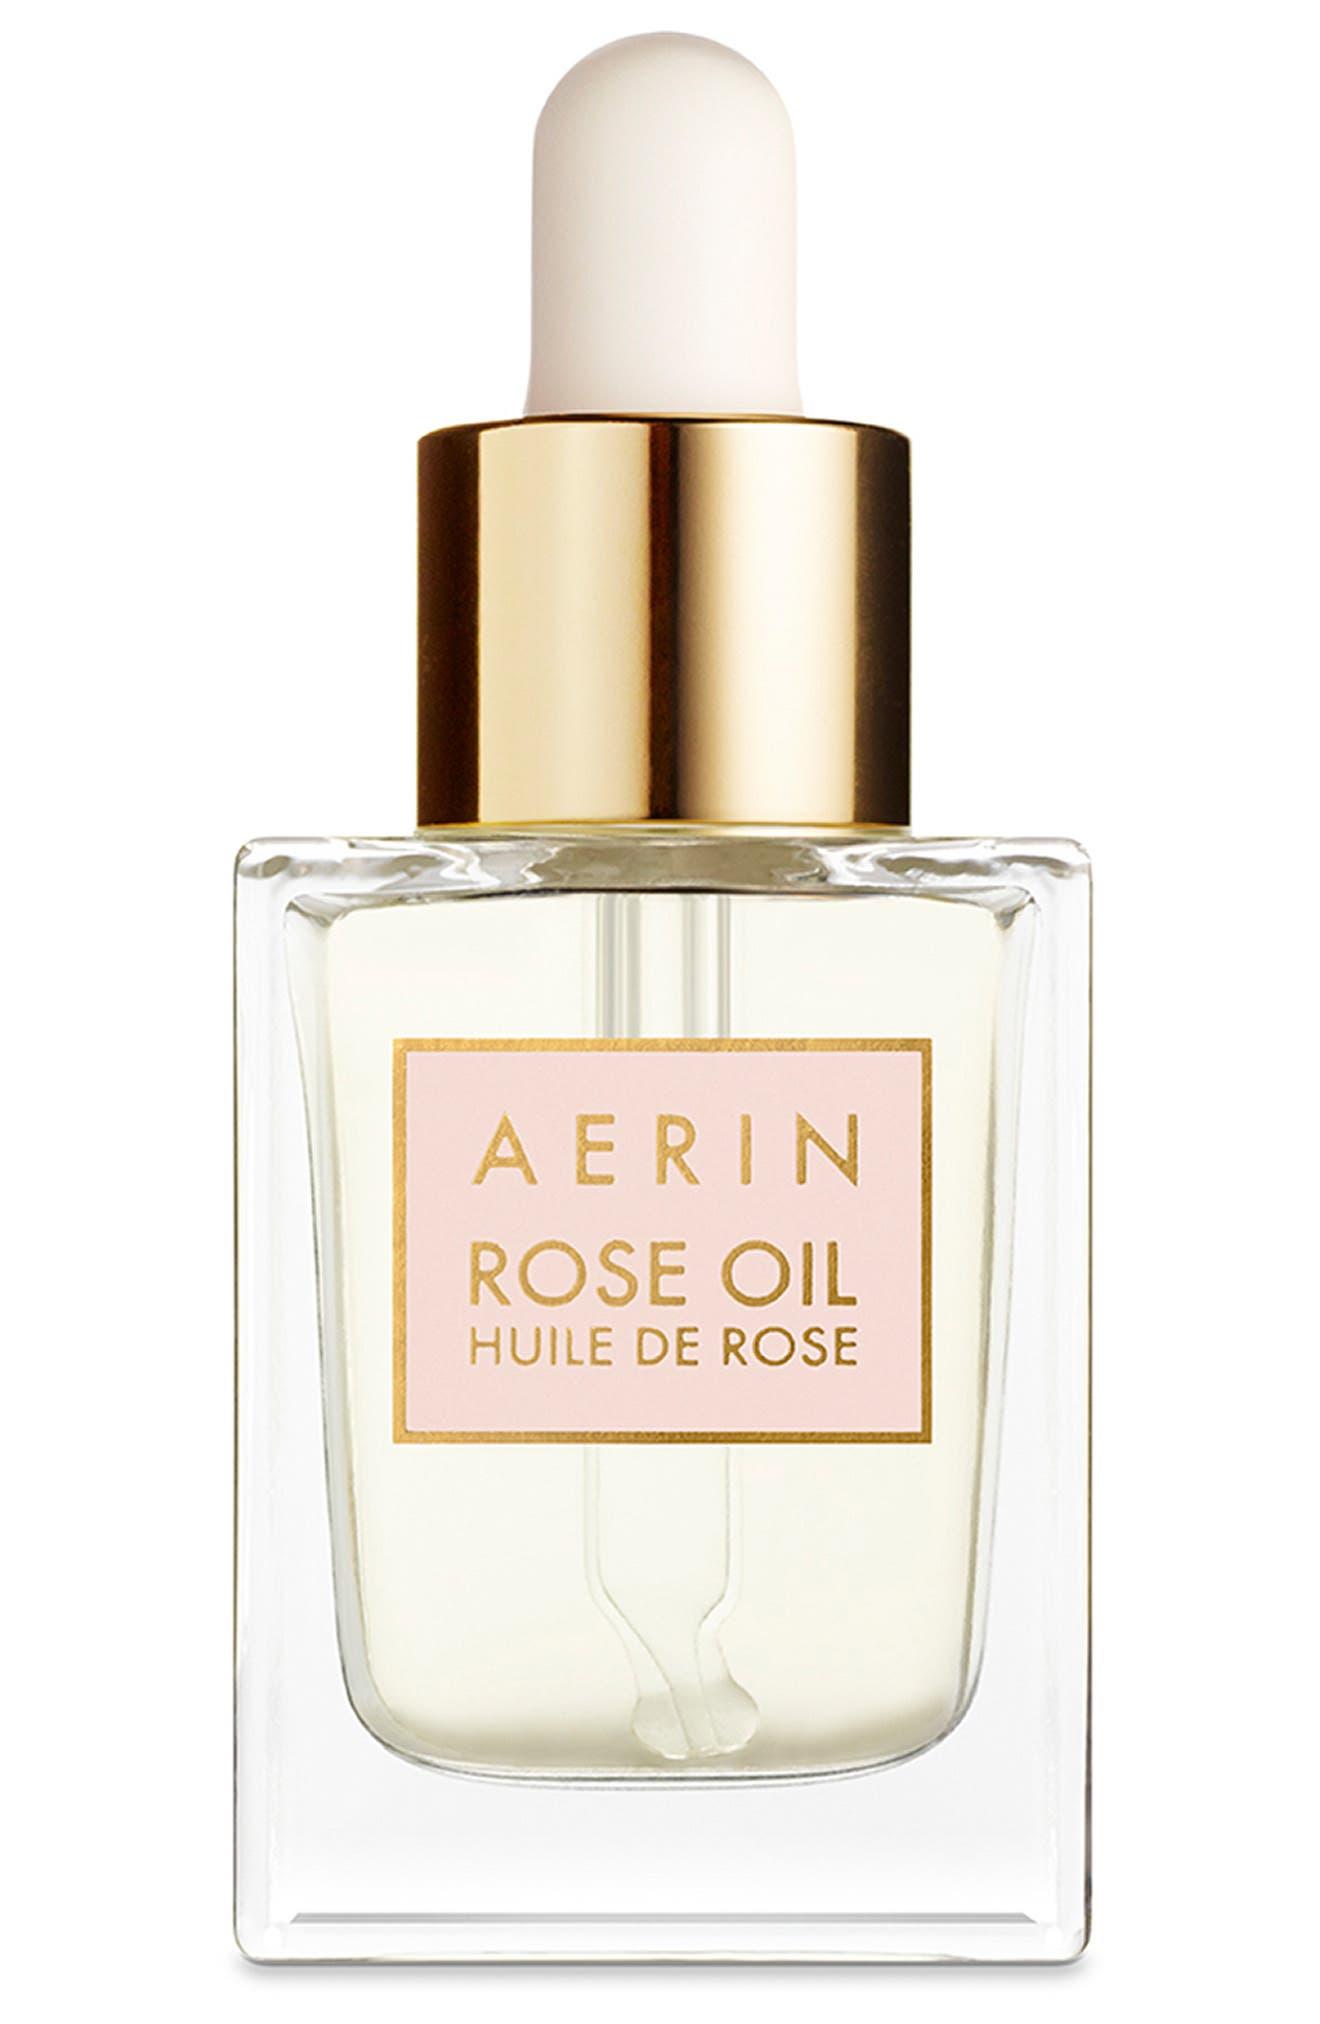 AERIN Beauty Rose Oil,                             Main thumbnail 1, color,                             NO COLOR